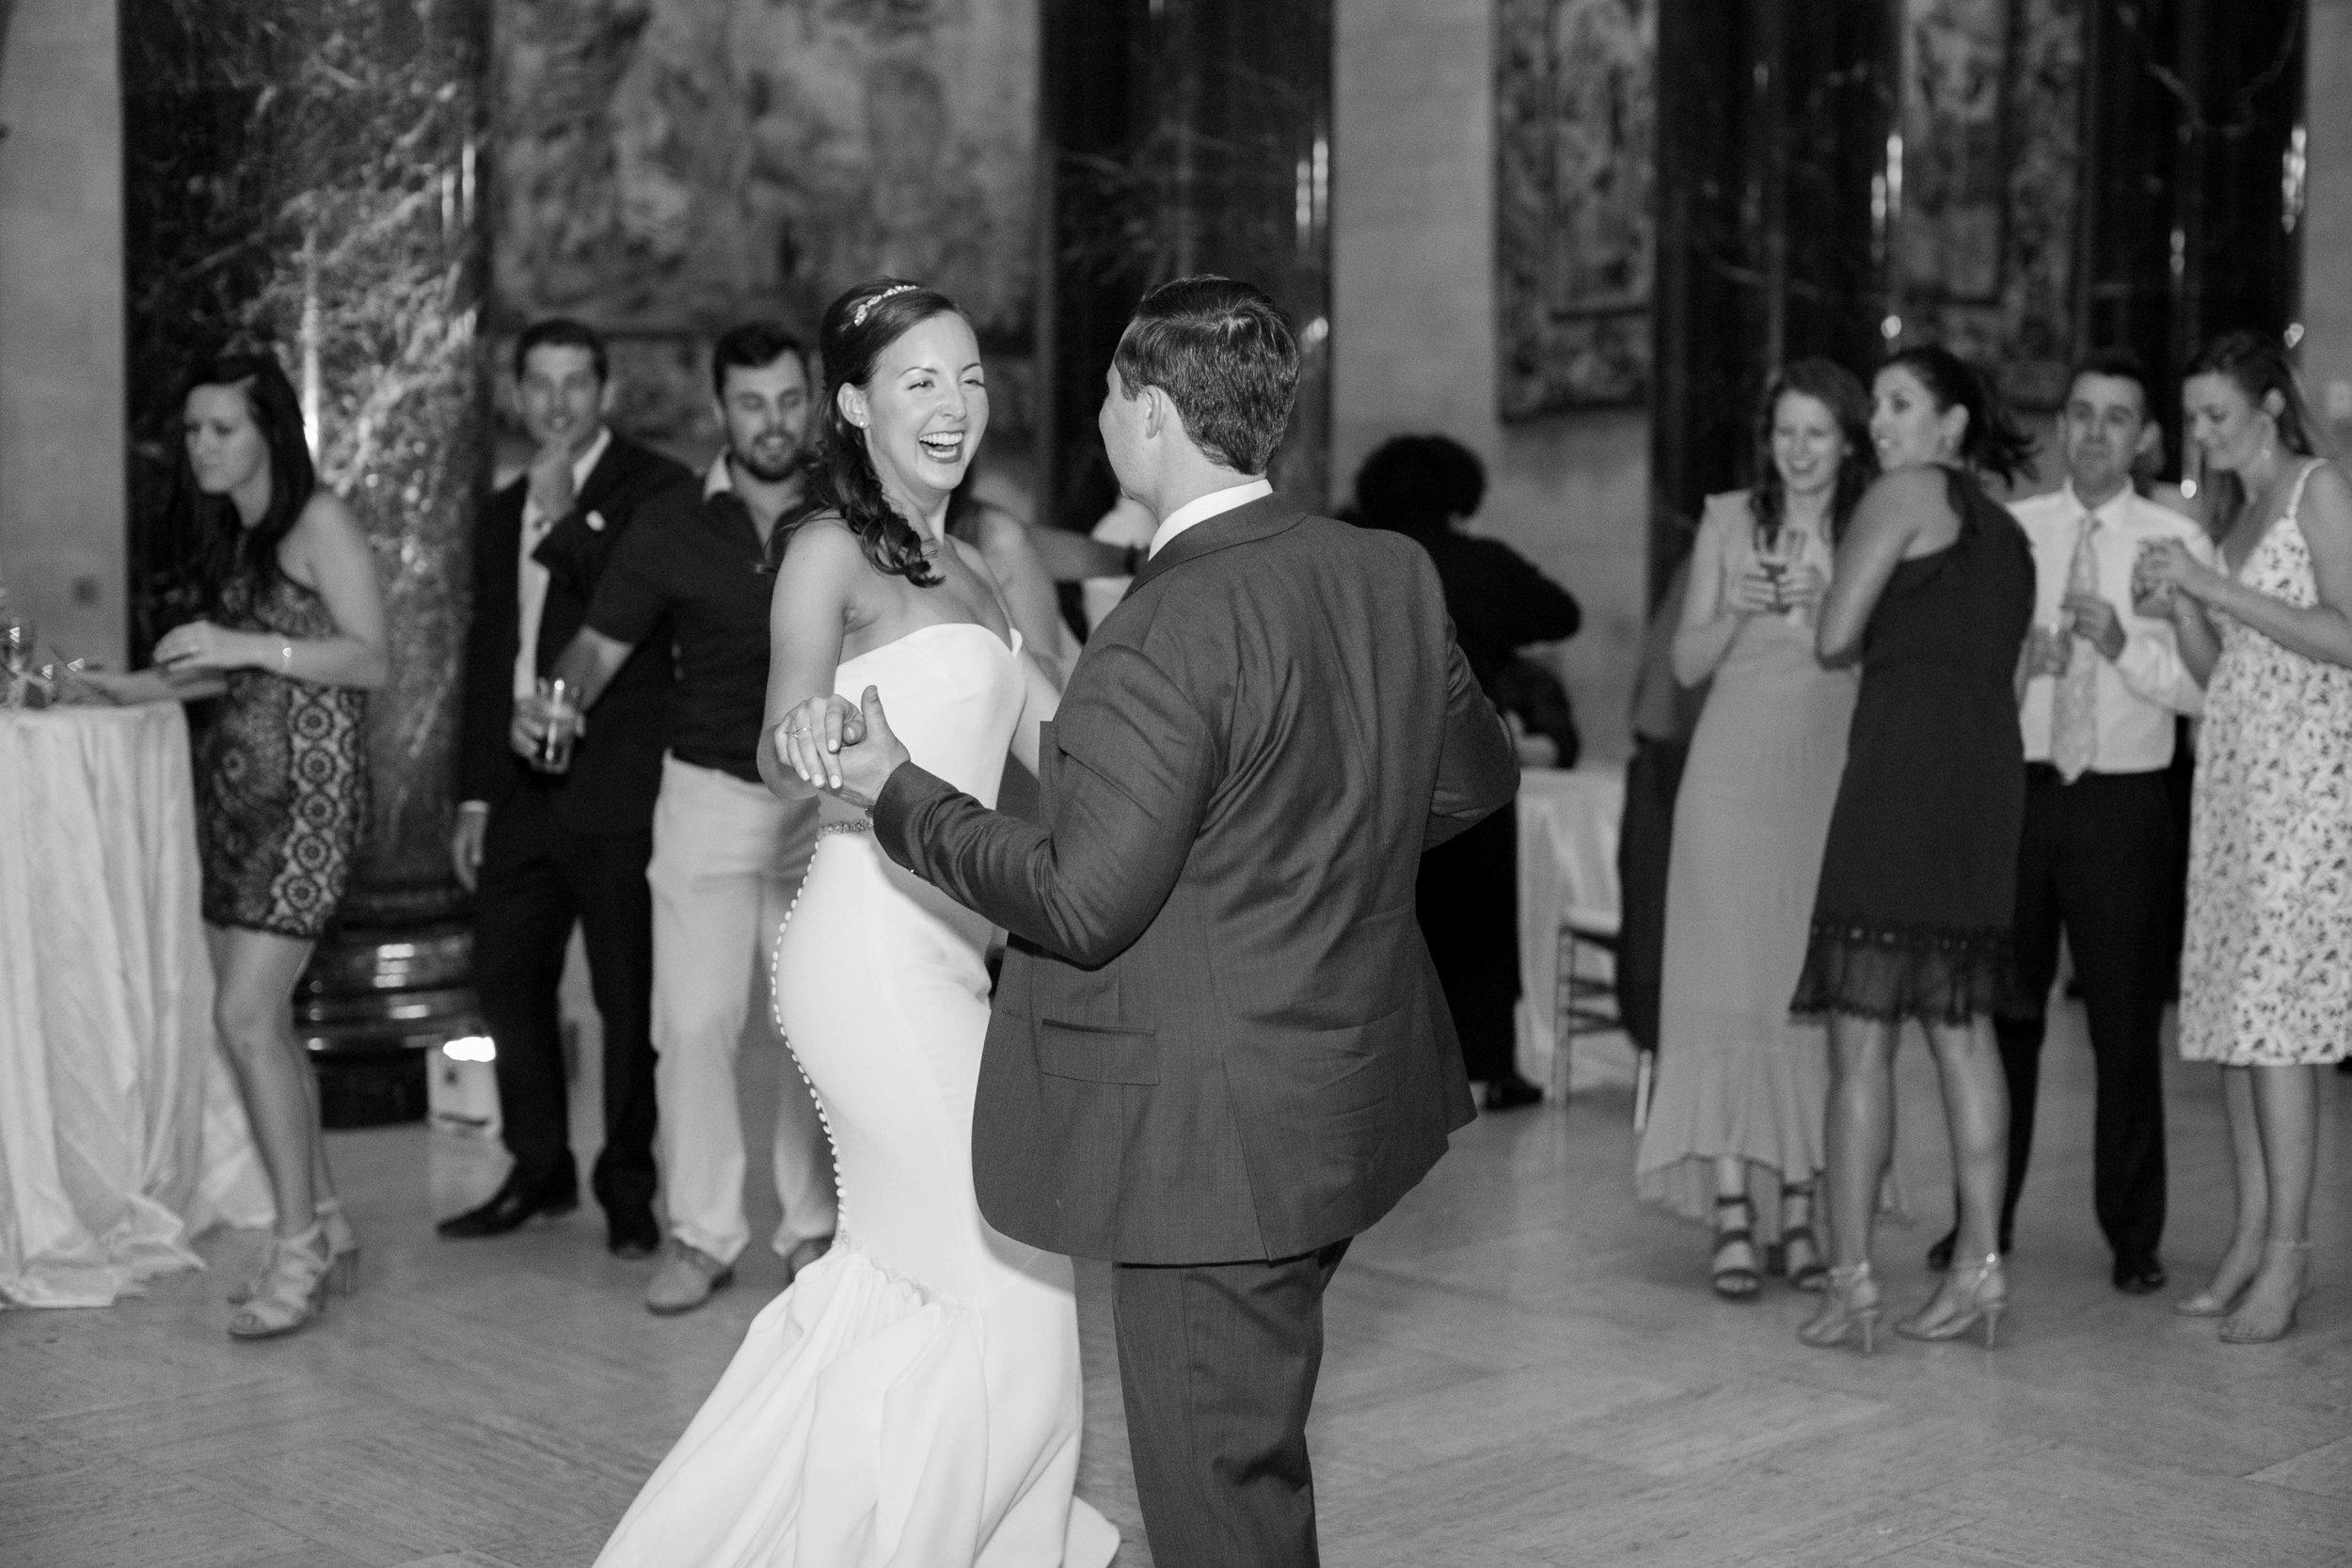 nelson-atkins-wedding-88.jpg